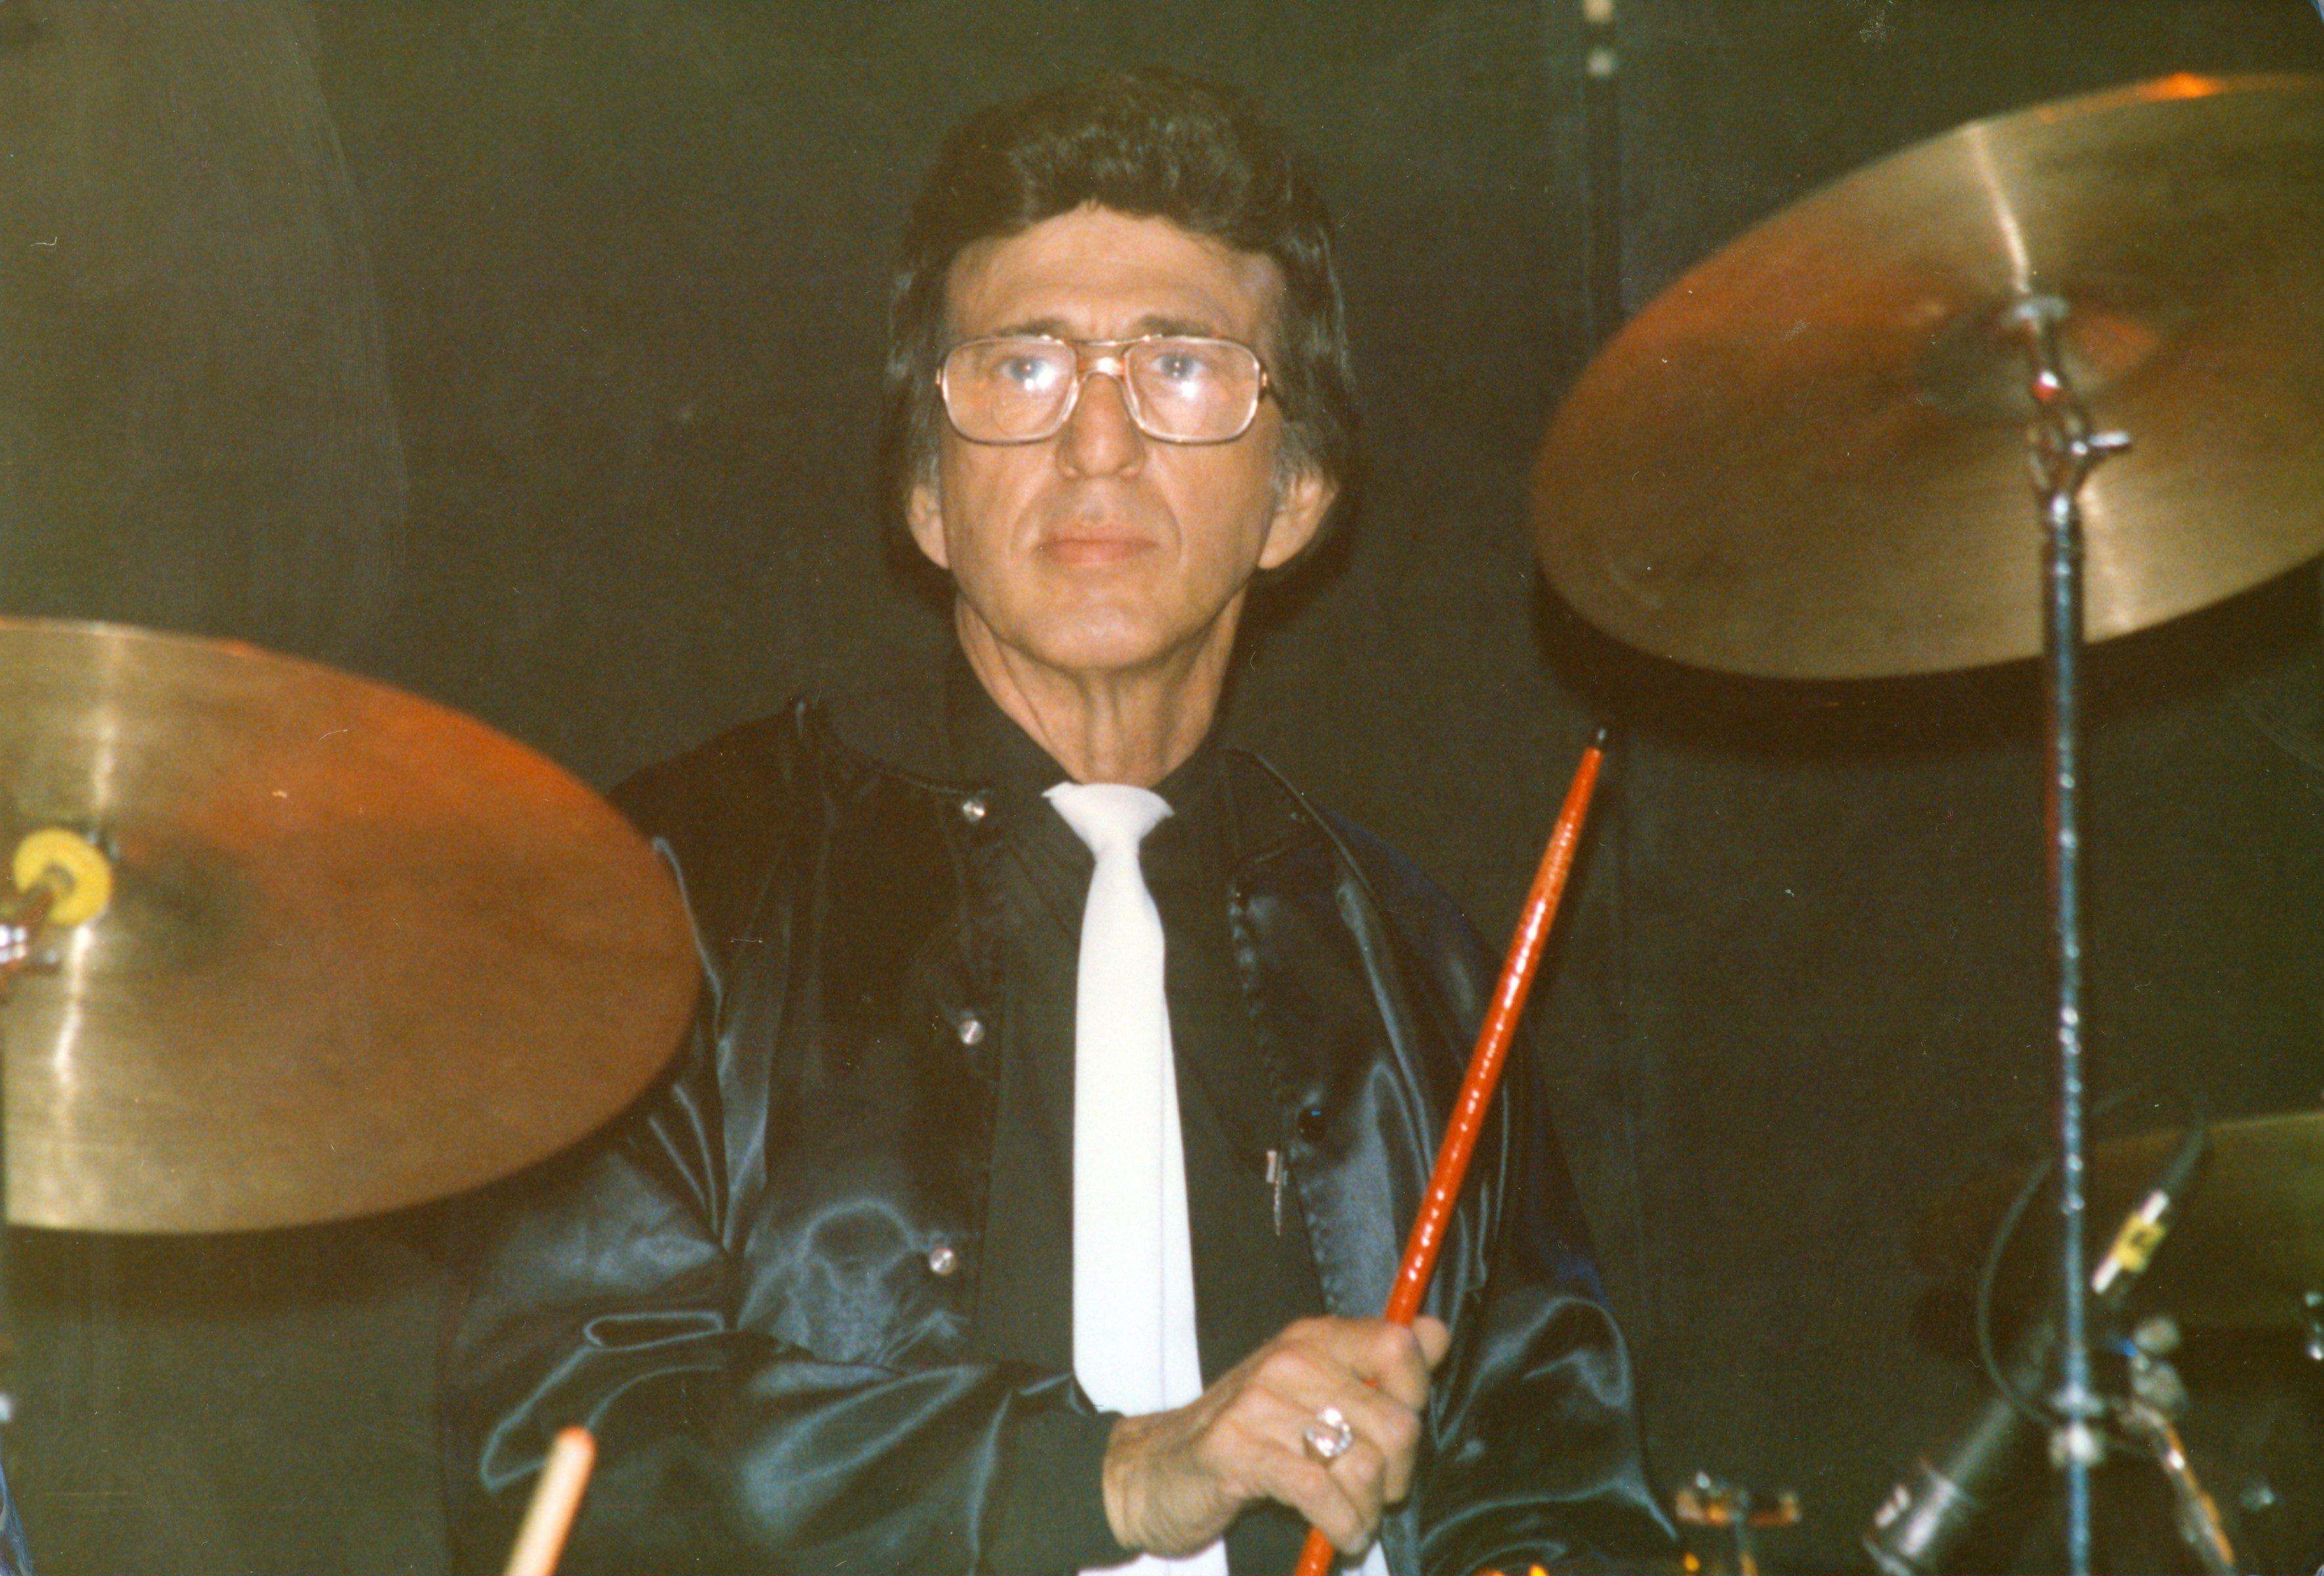 Elvis Presley's Drummer D.J. Fontana